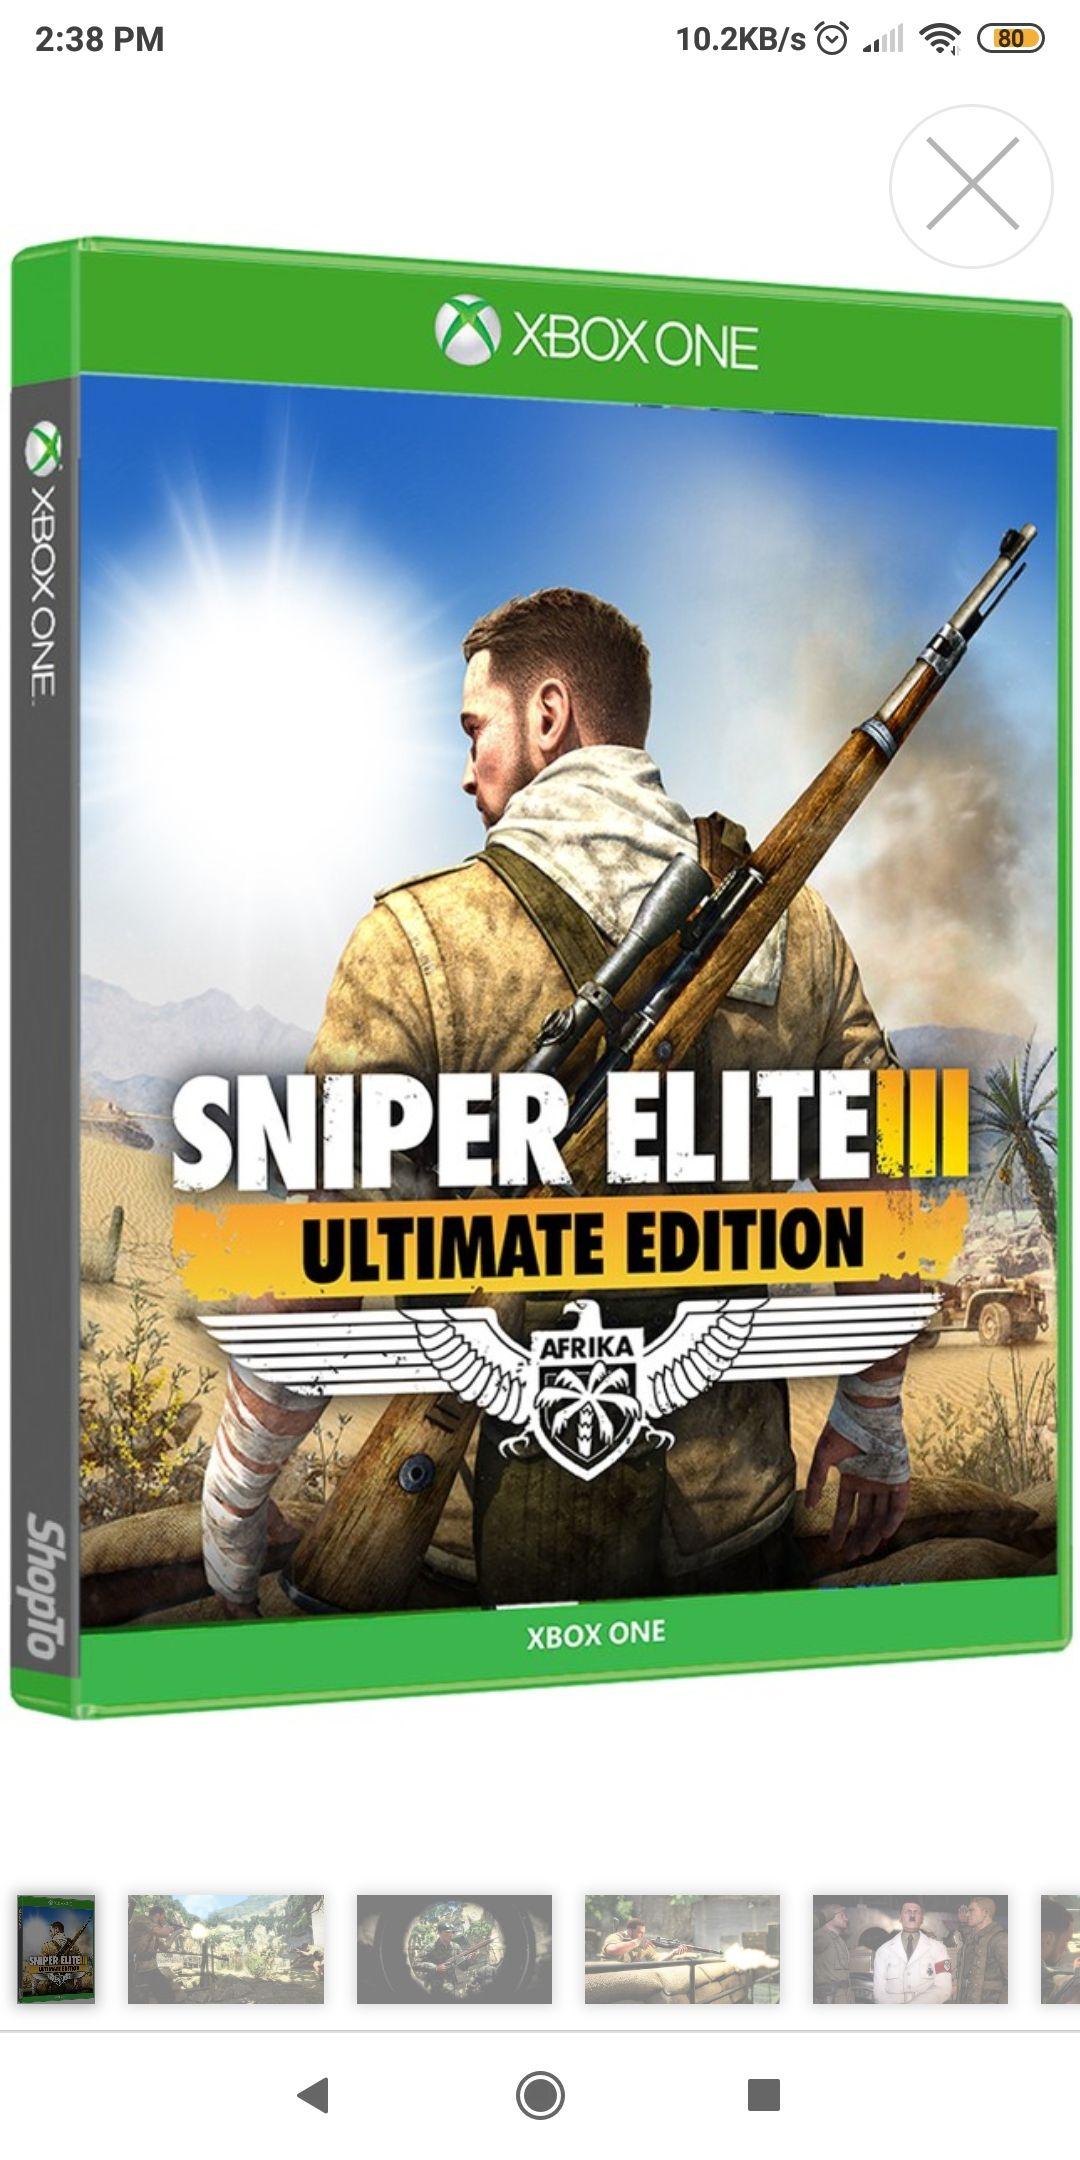 Xbox One S Sniper Elite 3 at ShopTo for £13.85